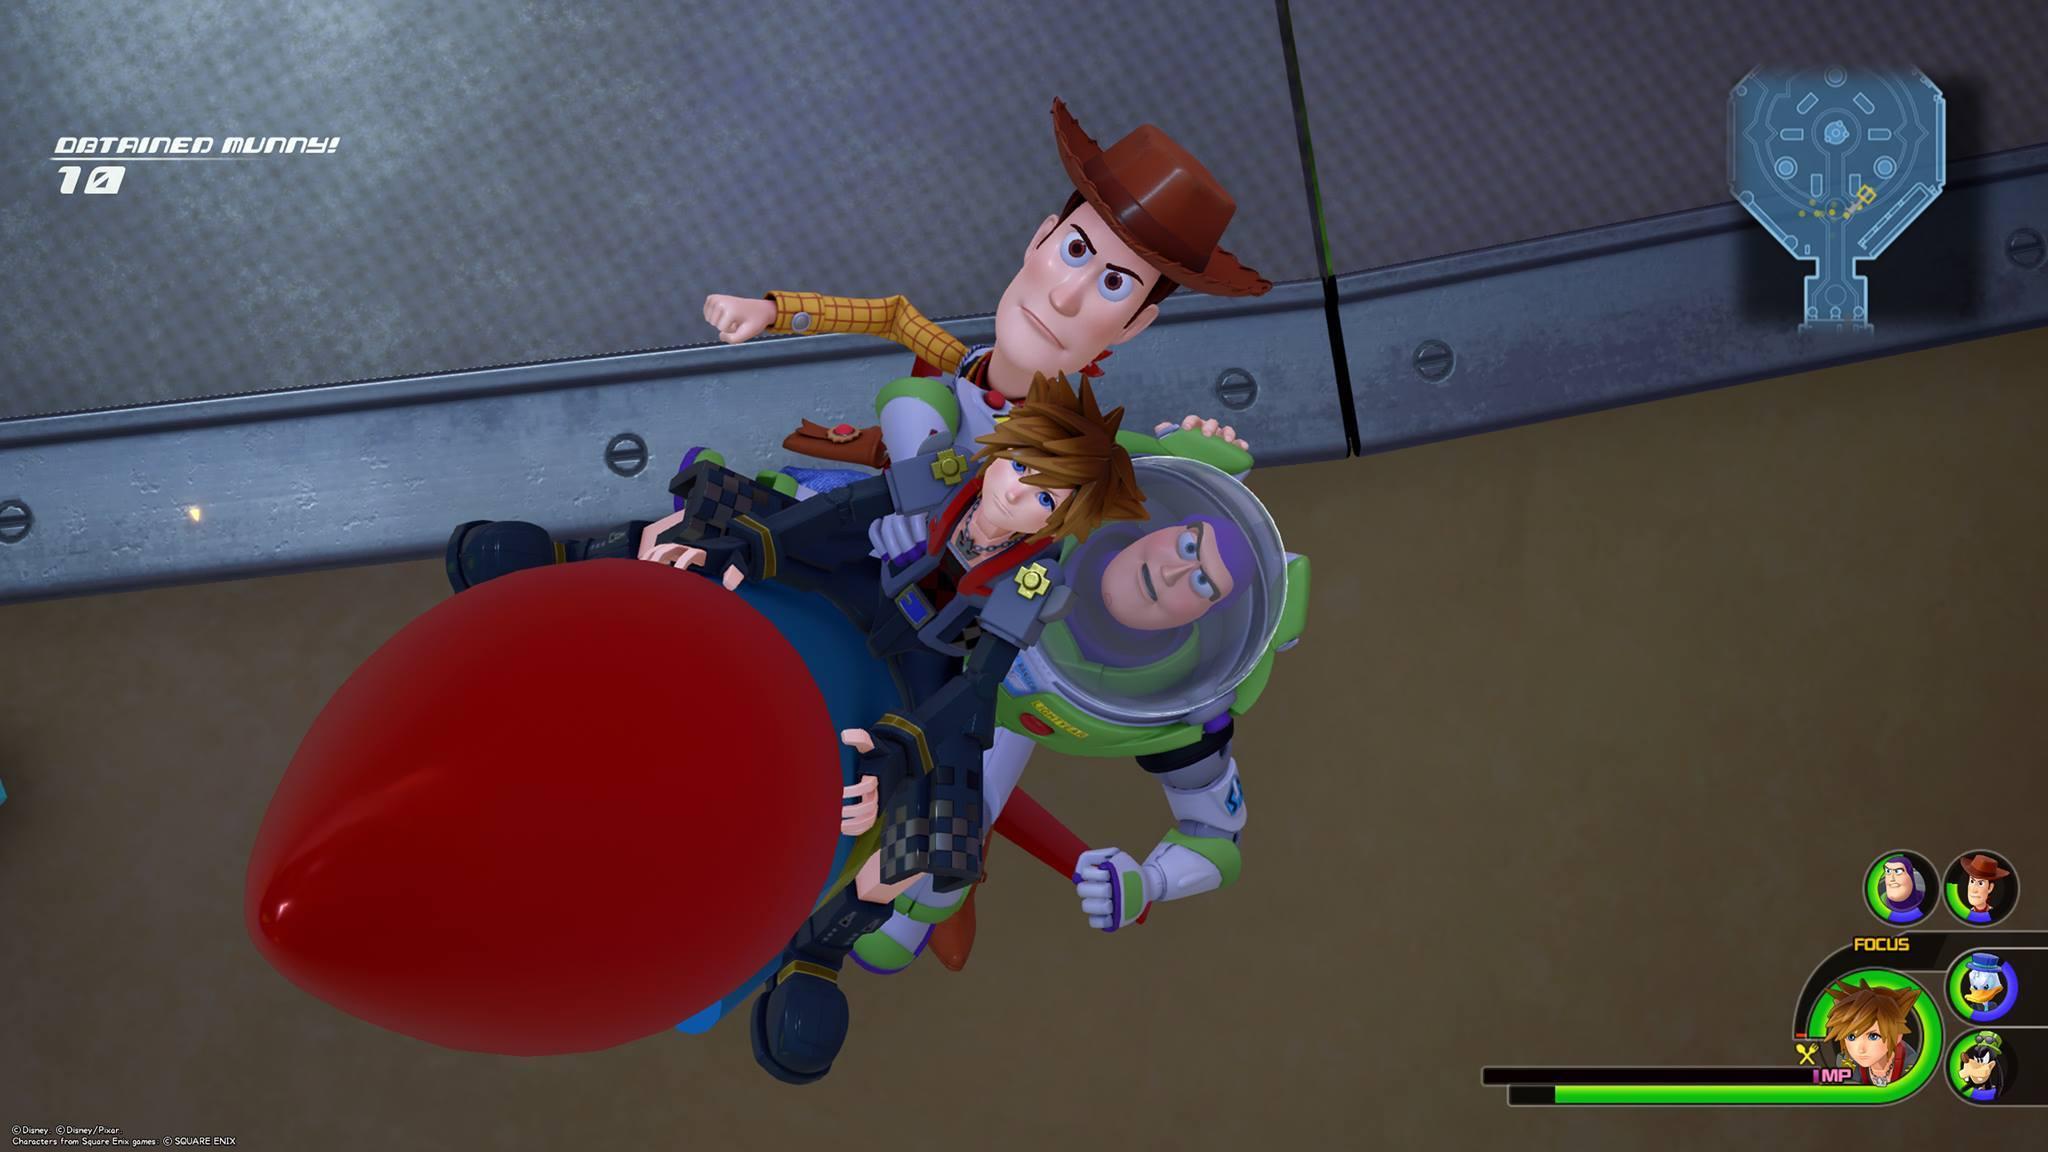 Toy Story dans Kingdom Hearts 3 avec Buzz et Woody